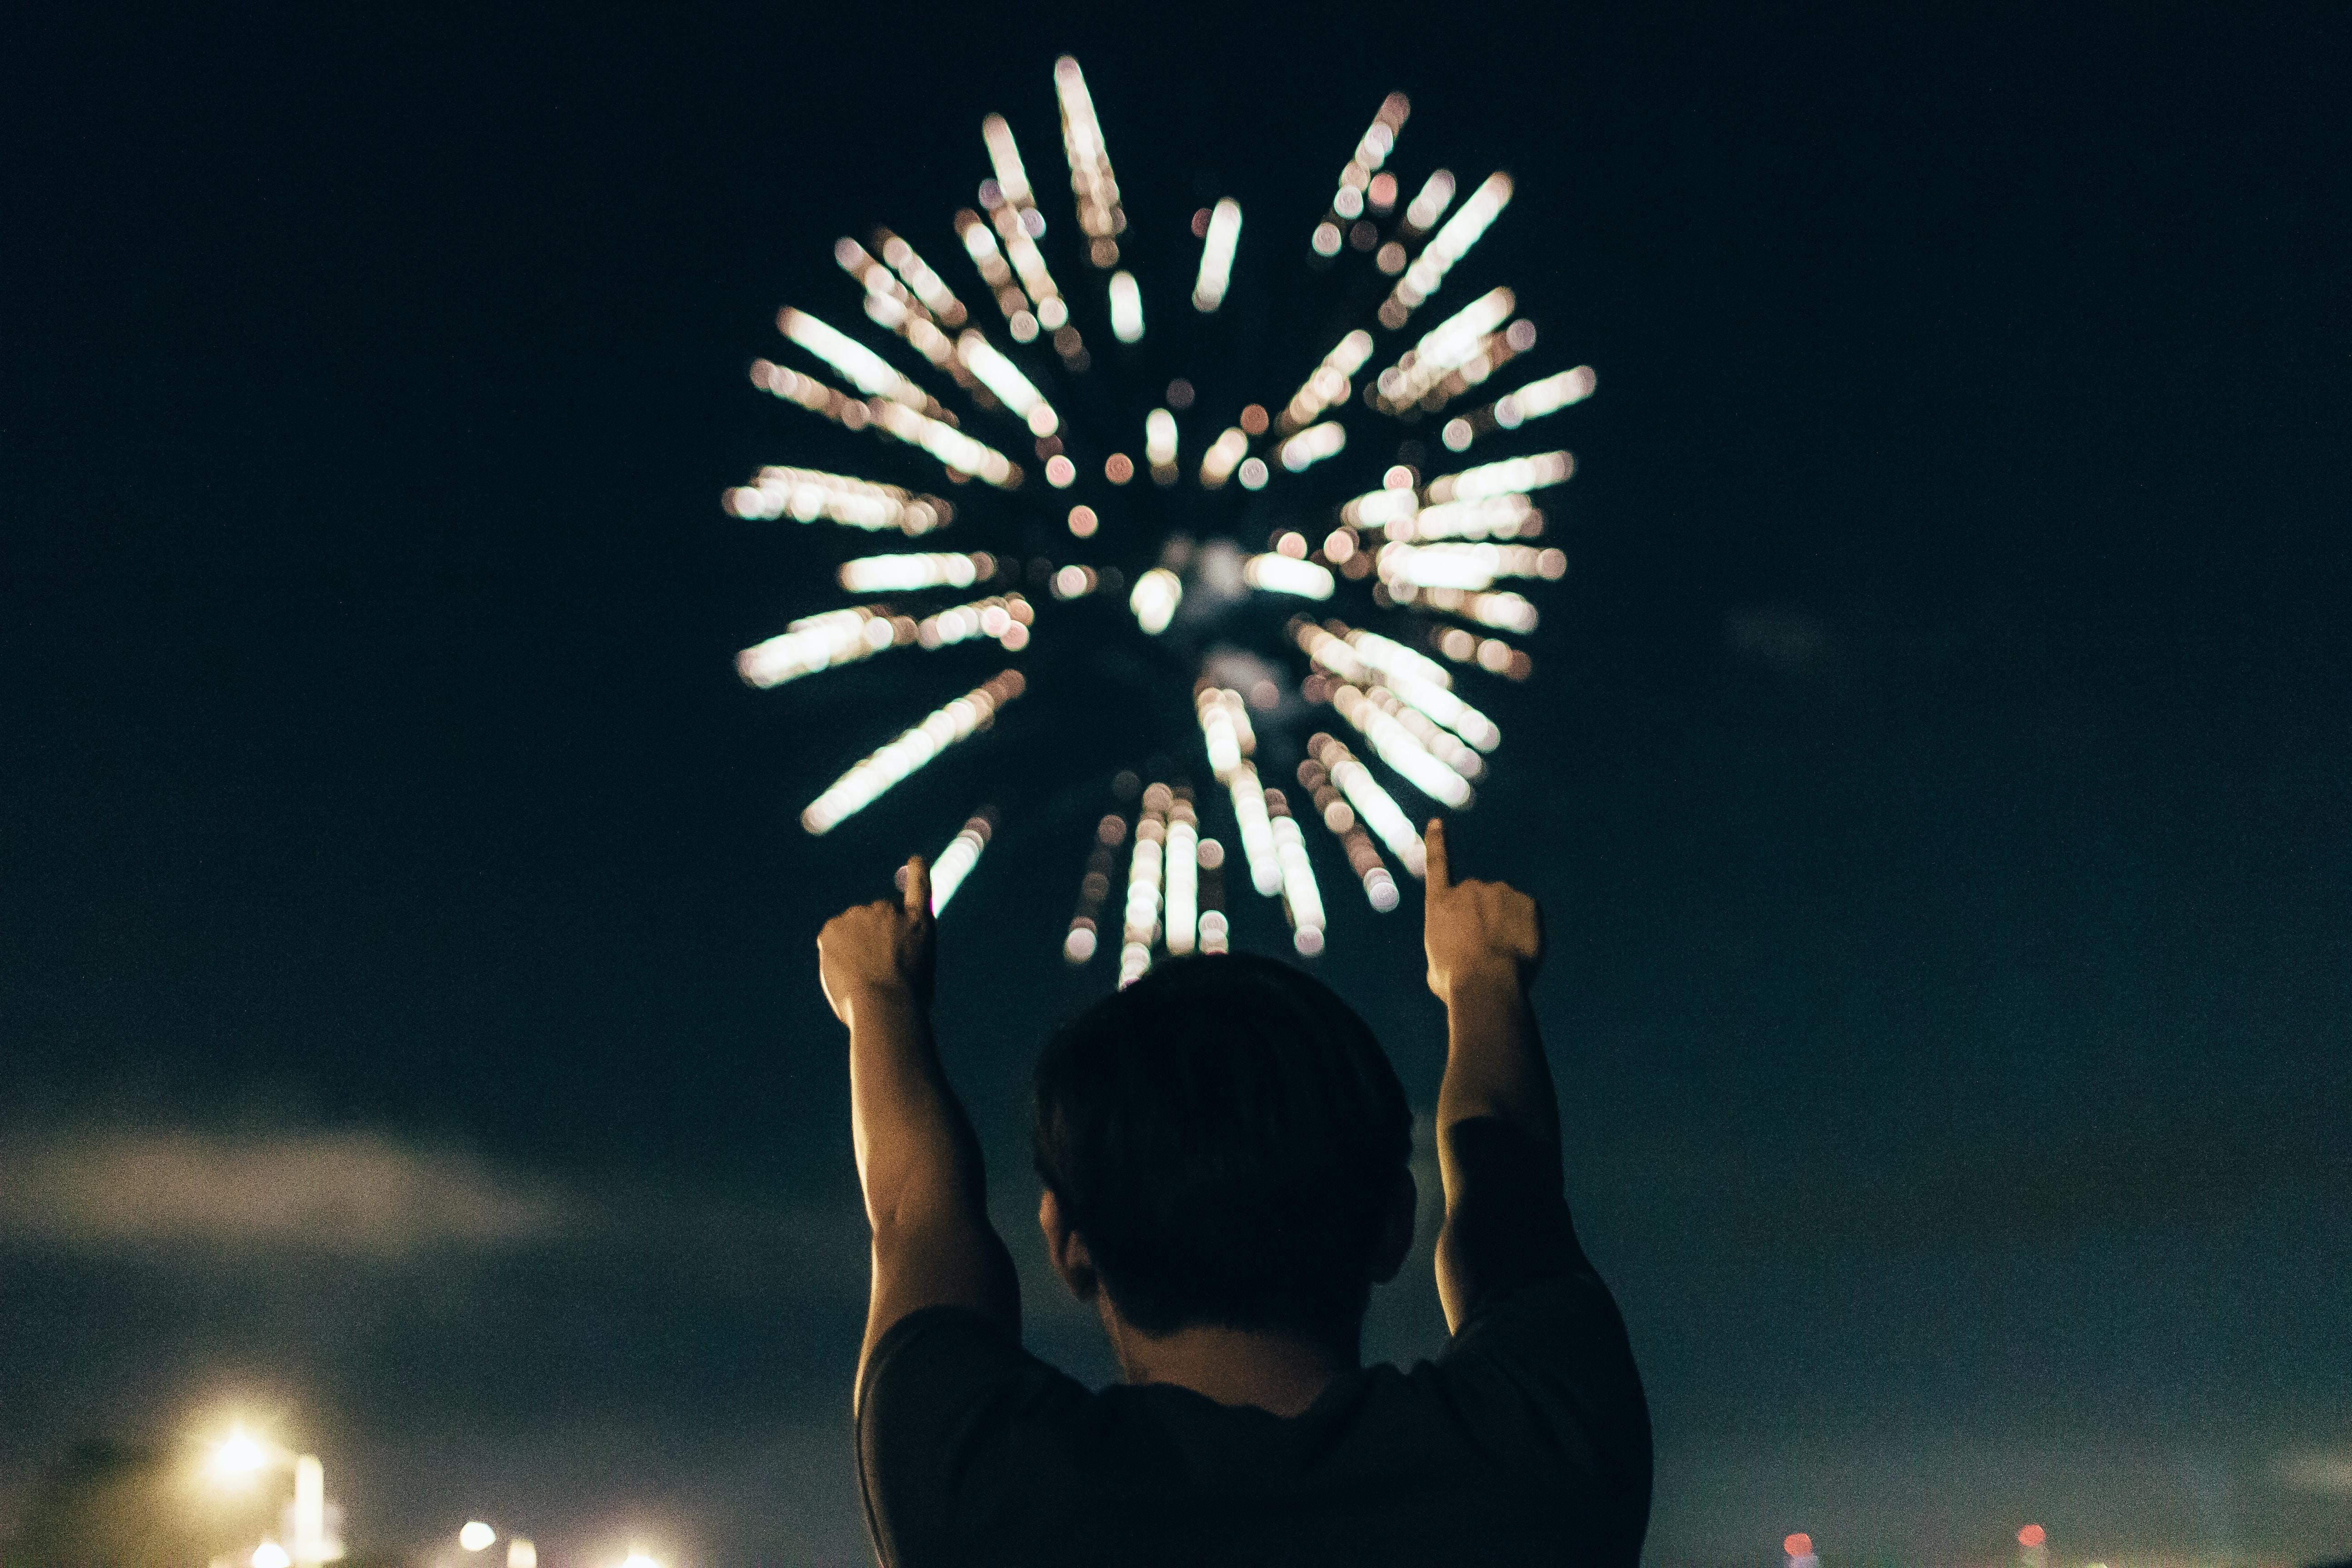 man in black shirt pointing towards brocade fireworks in the skies